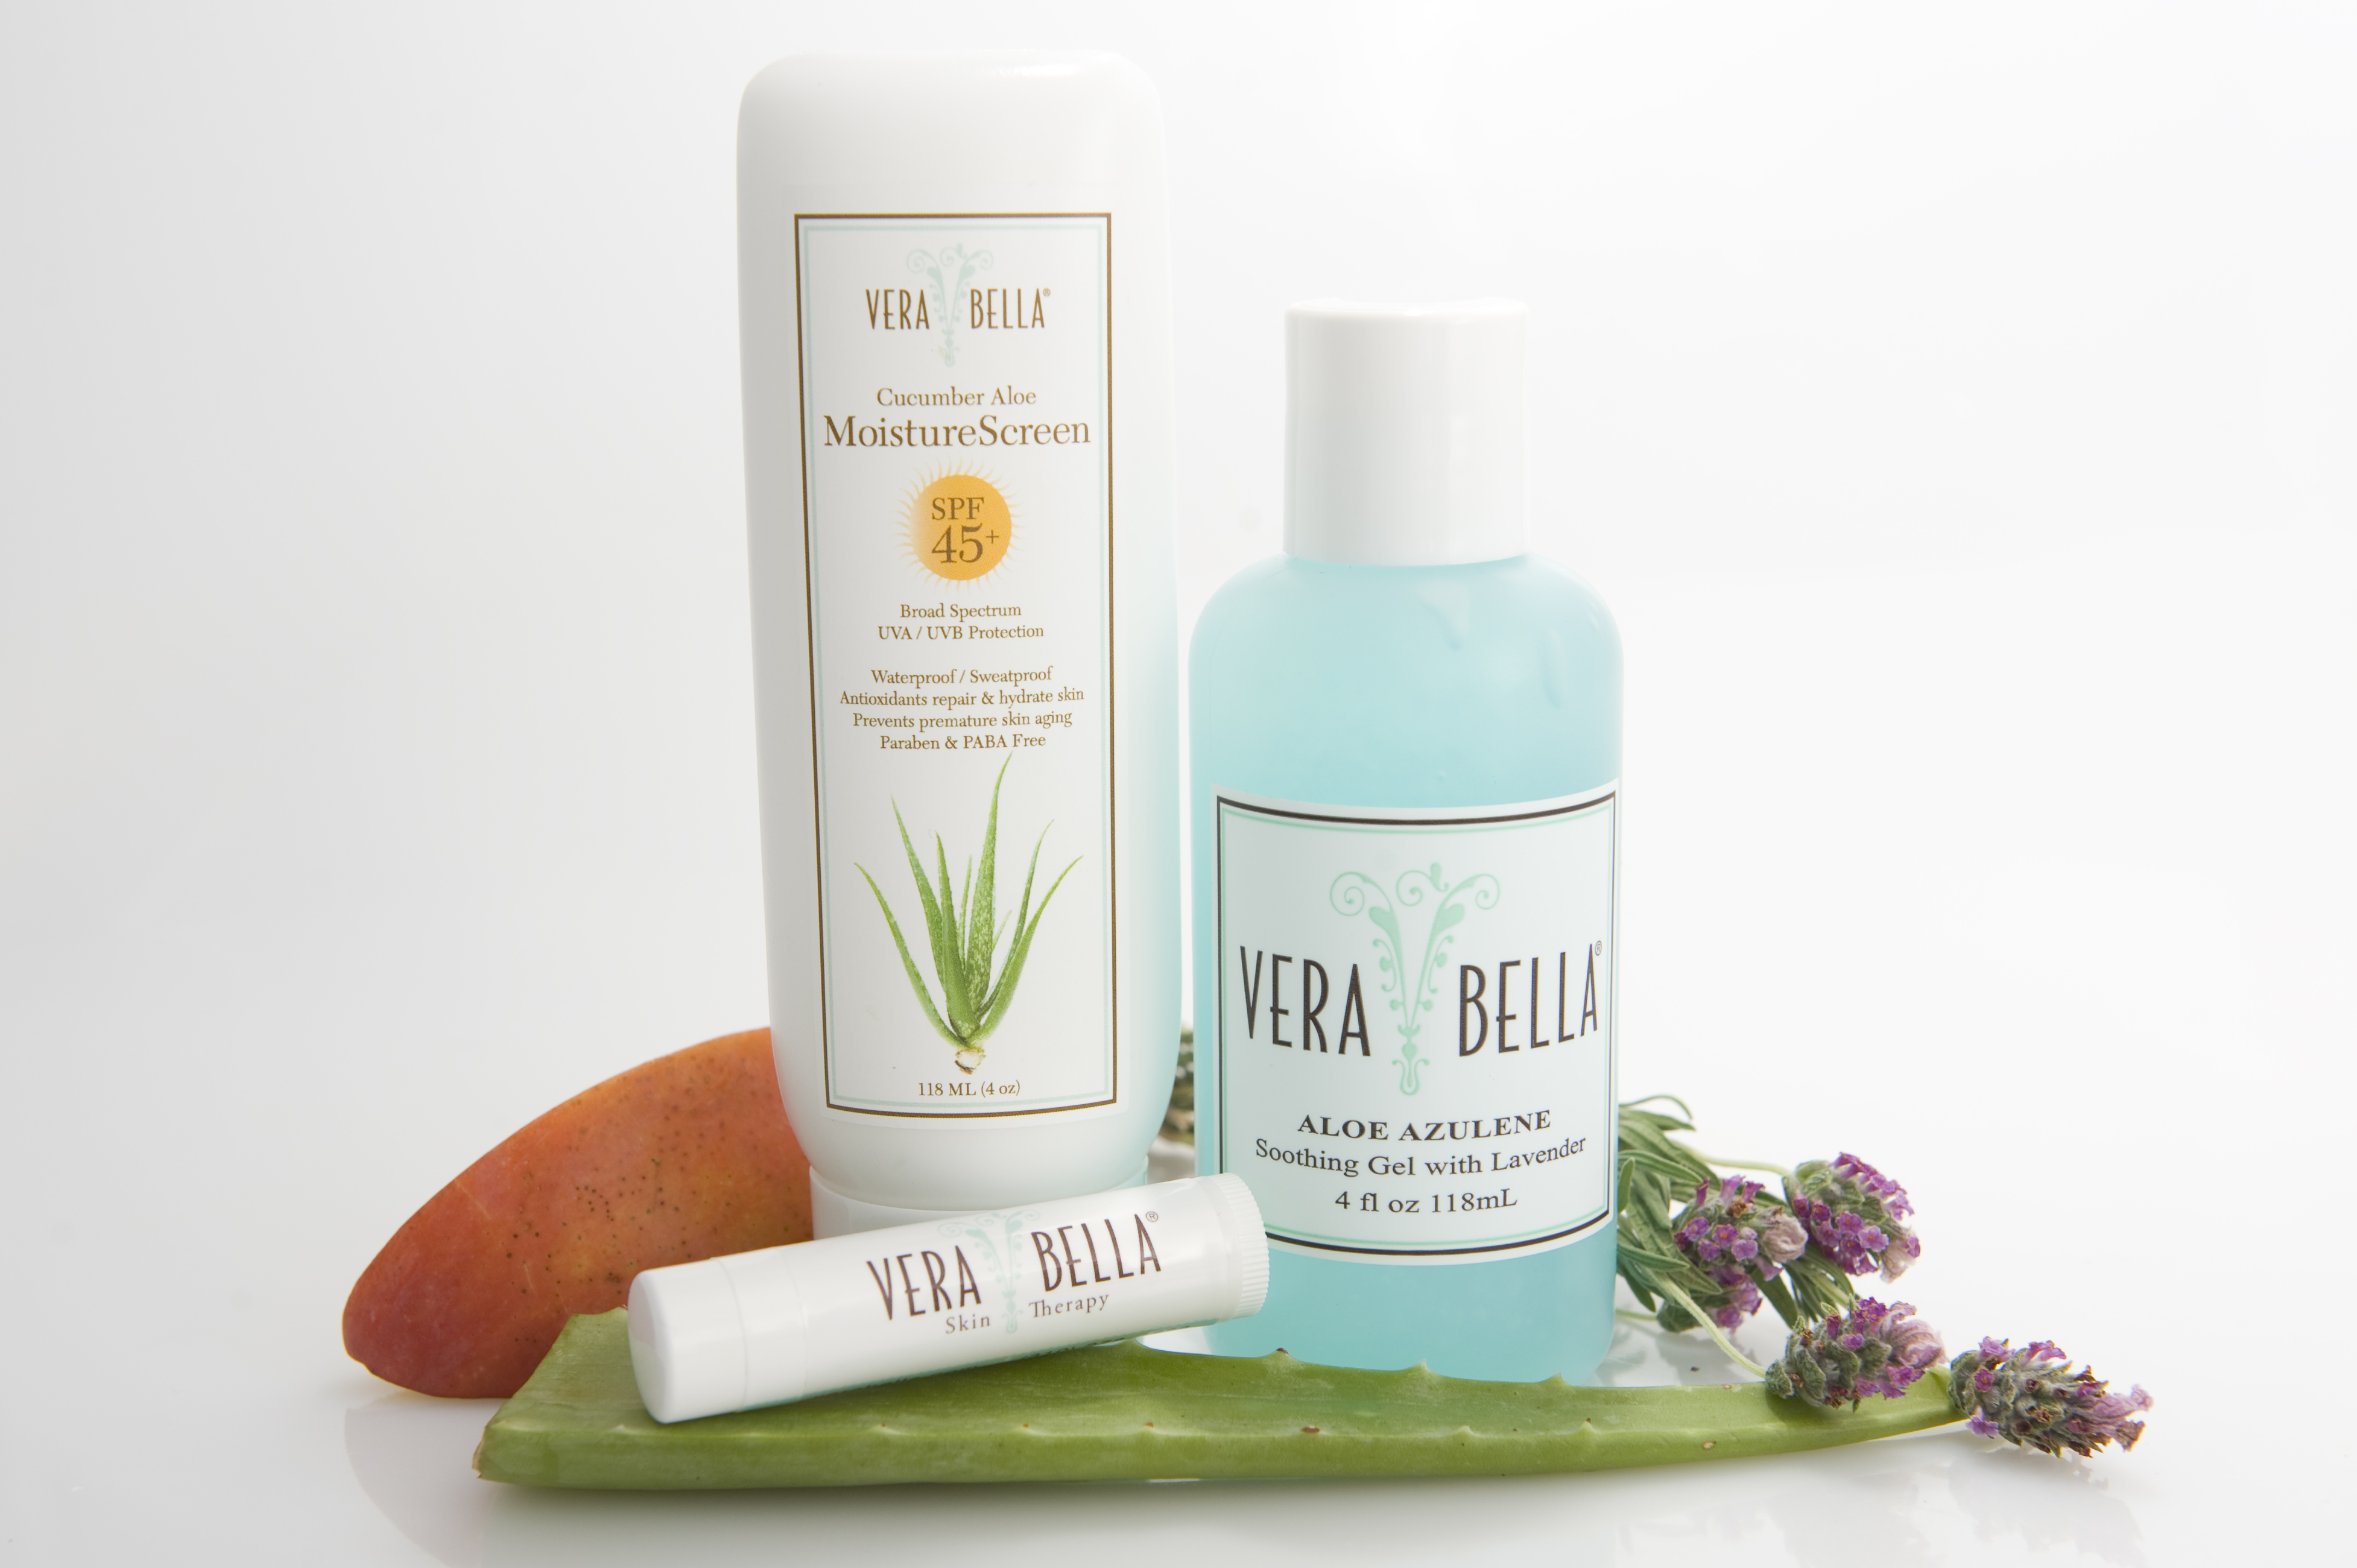 Verabella Skin Therapy, Beverly Hills CA